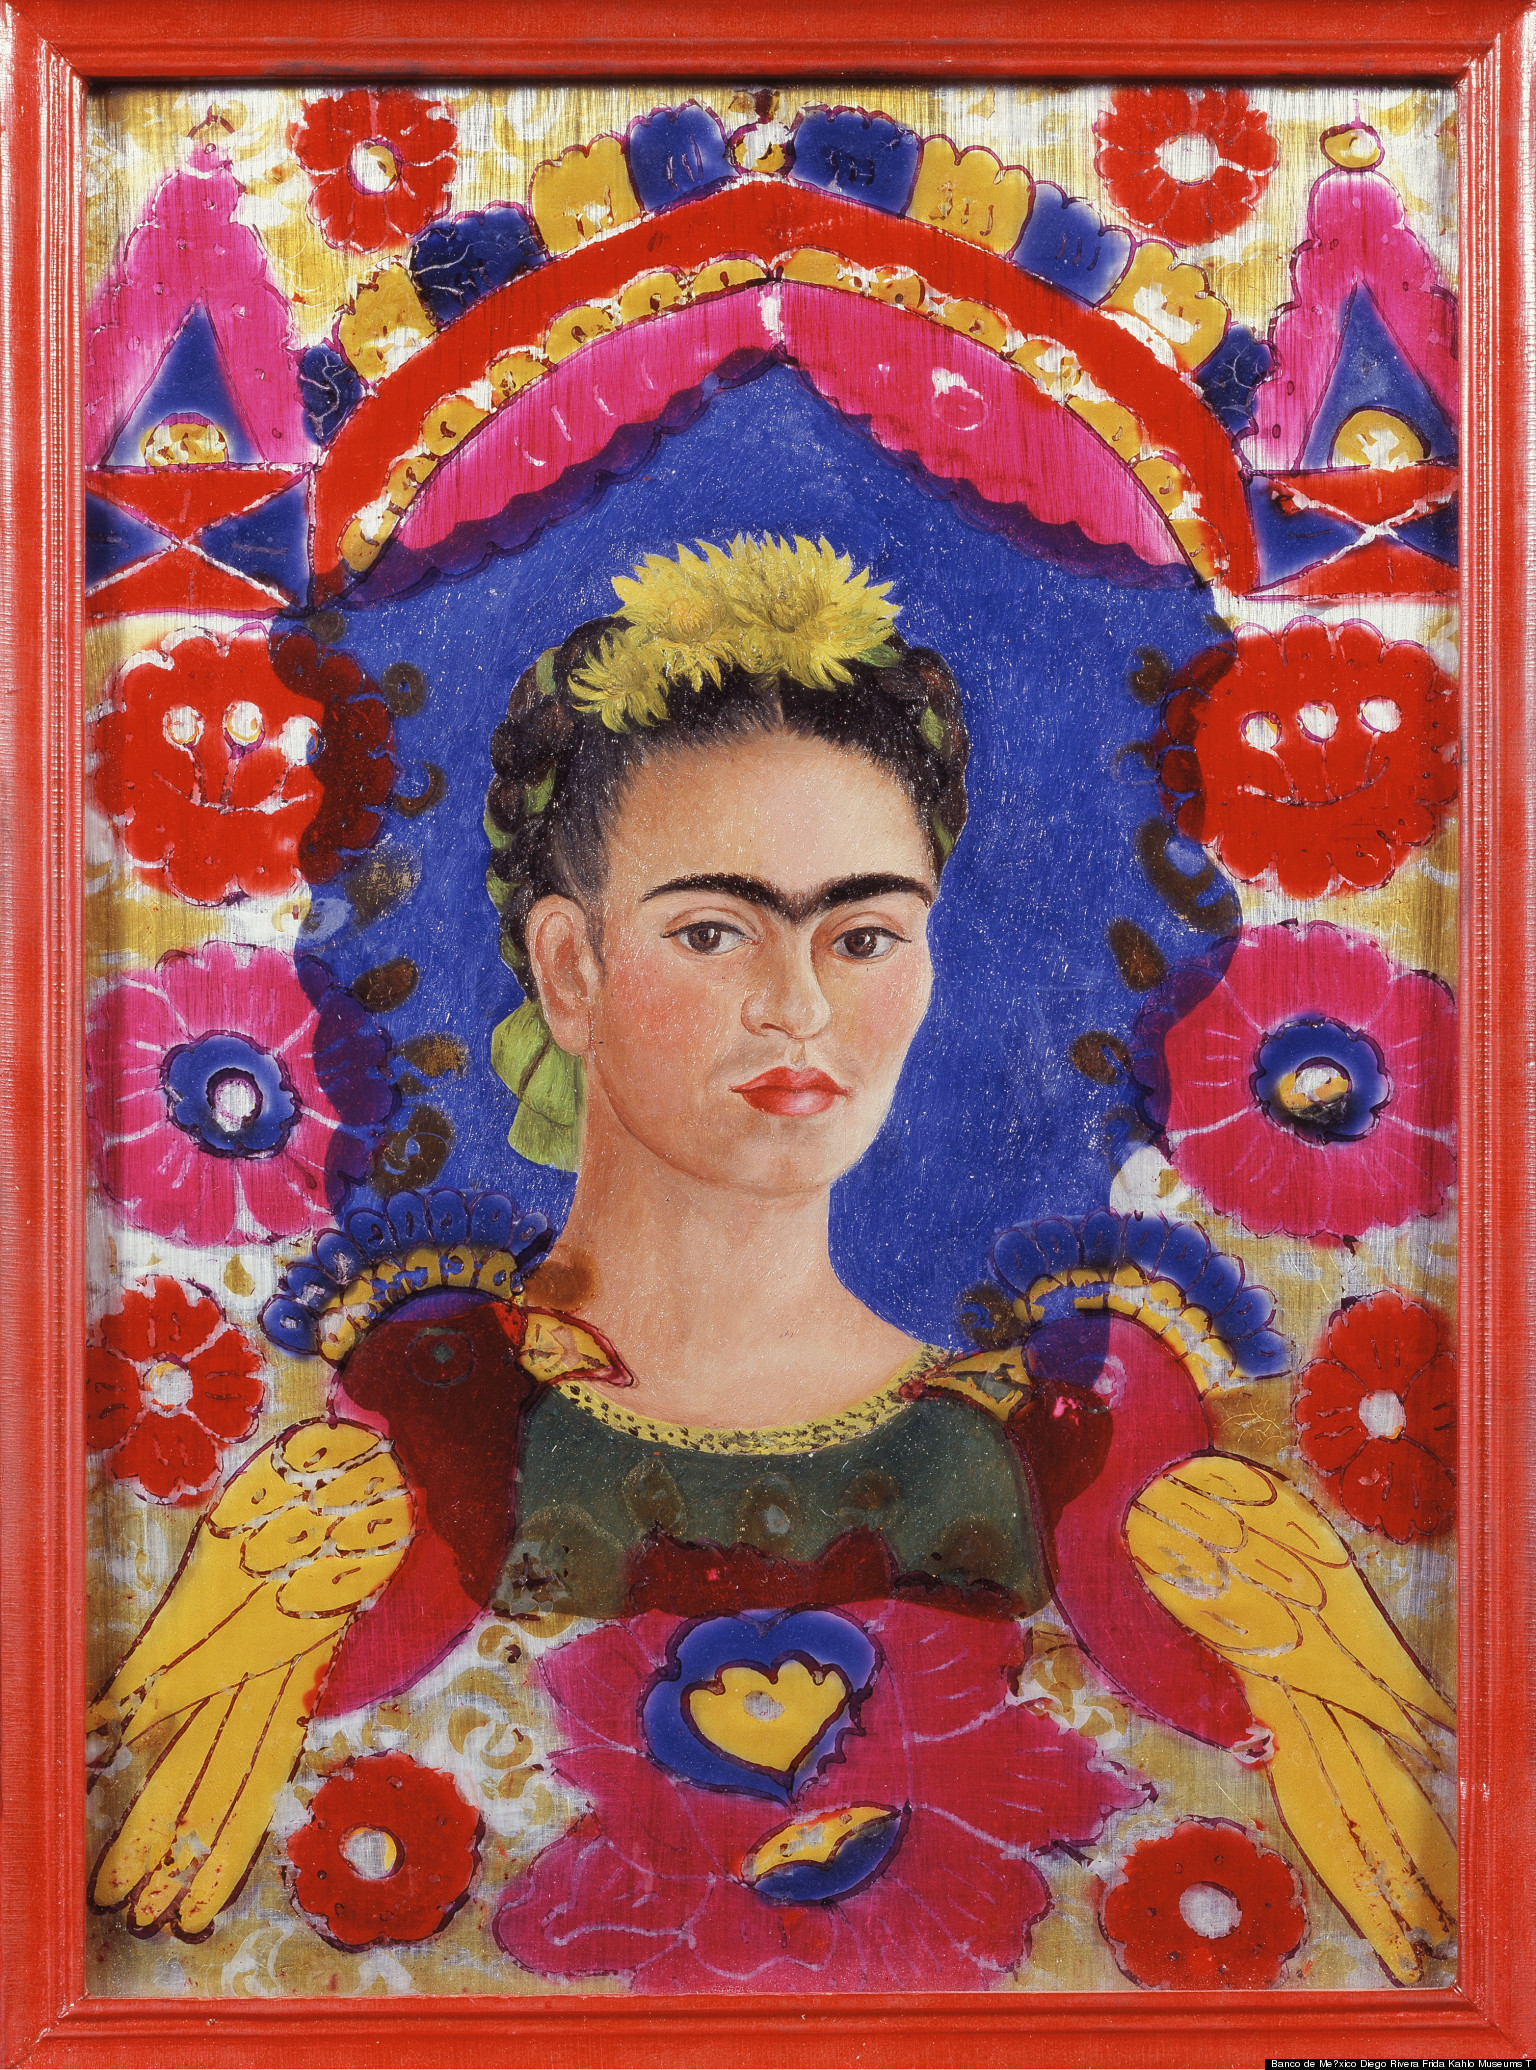 Female Artists Exhibition: 'Elles: SAM-Singular Works By